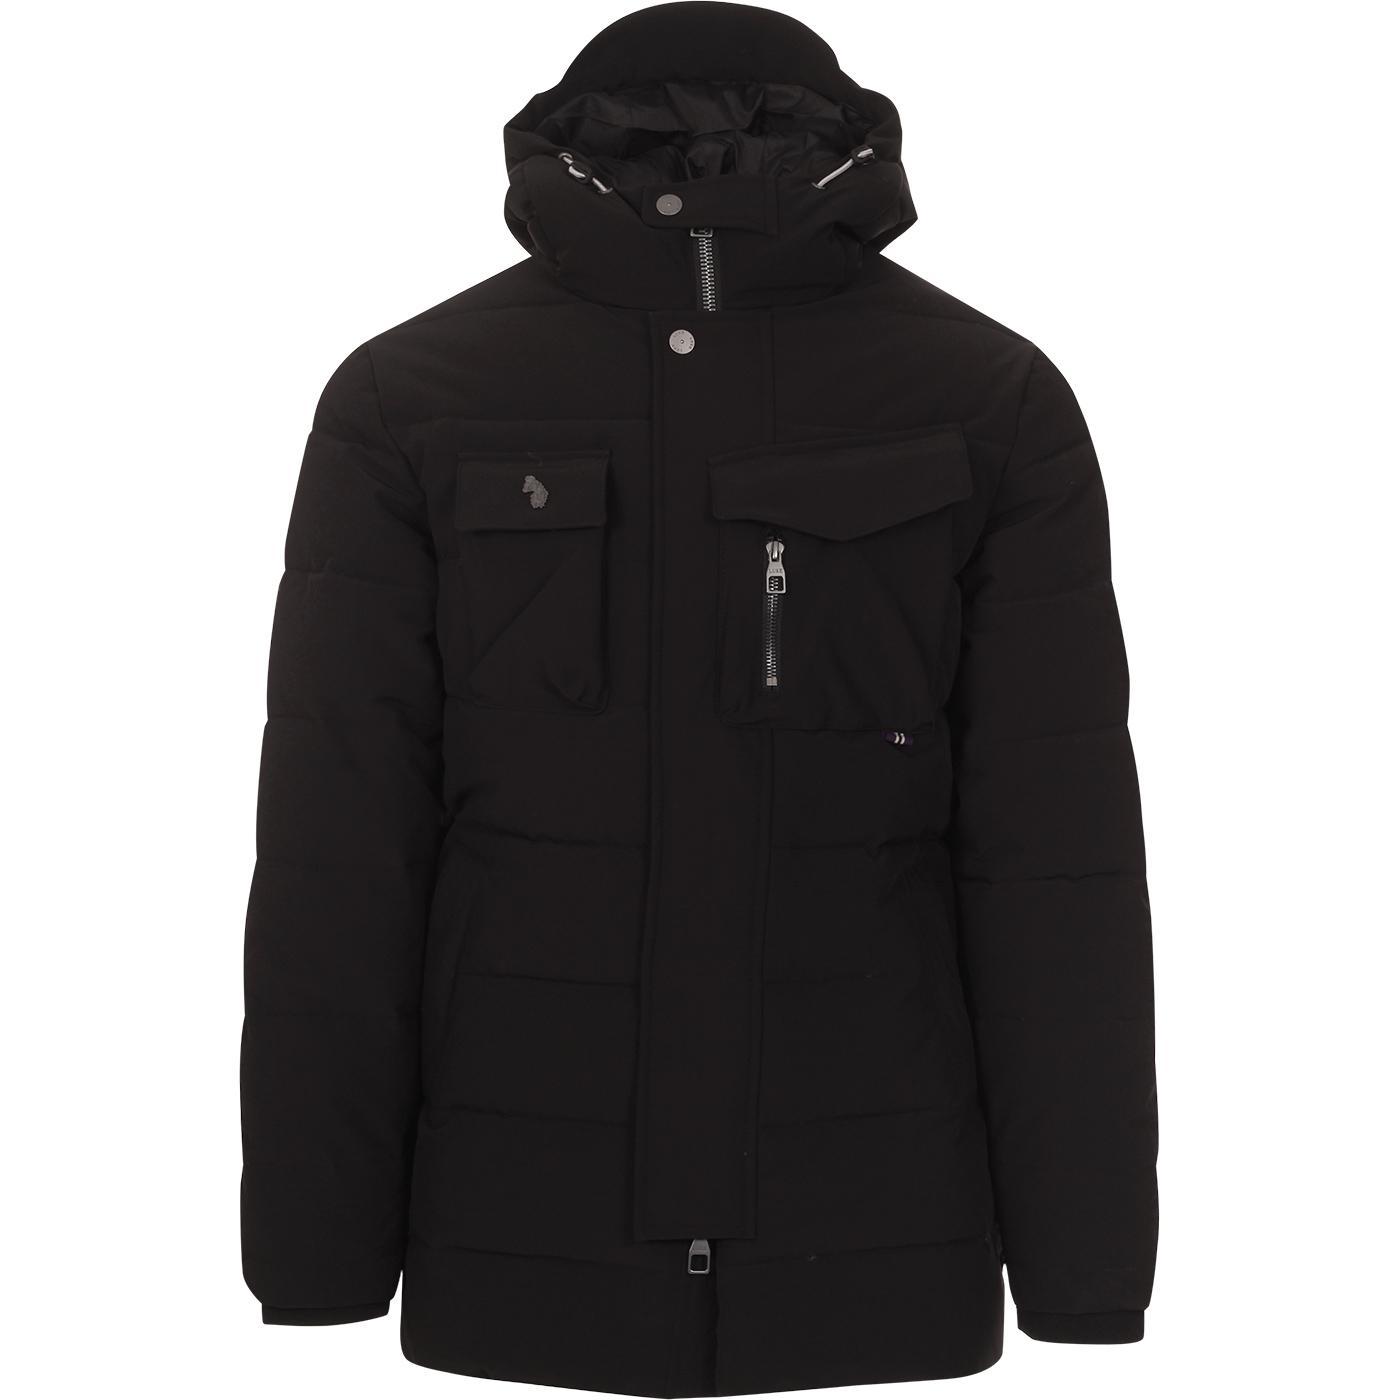 Utilitarian LUKE Men's Retro Padded Parka Jacket